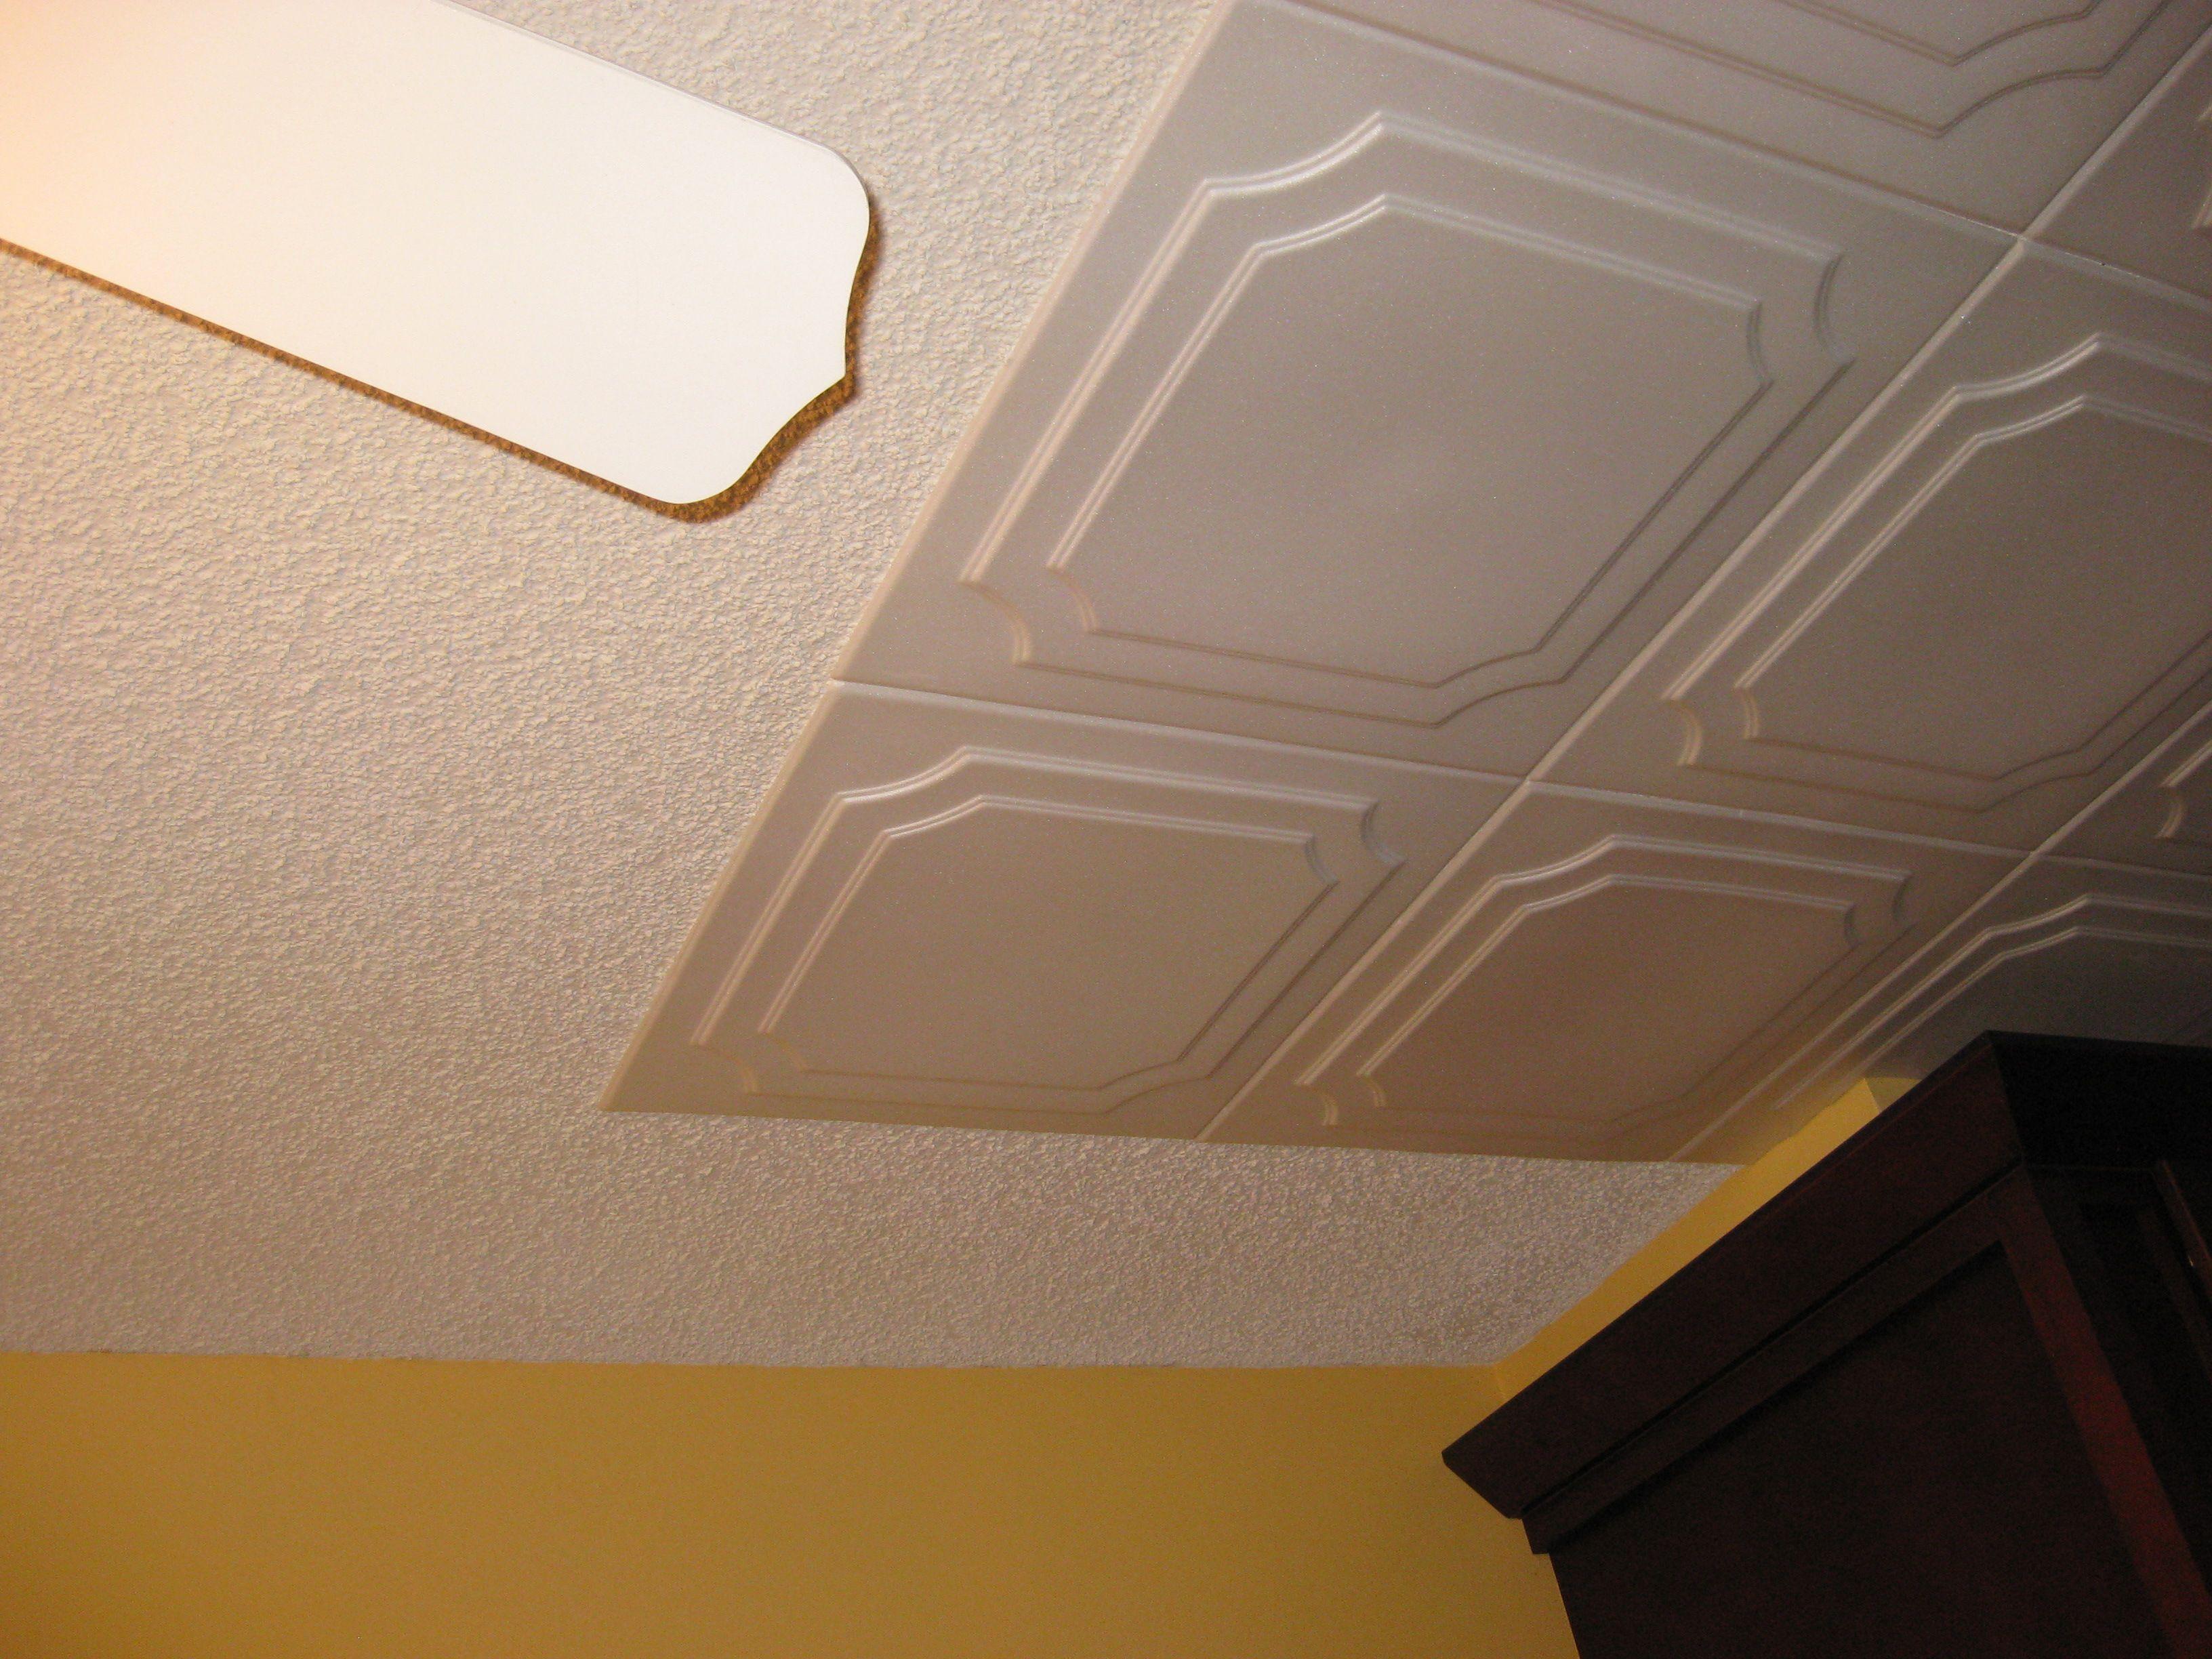 Styrofoam Decorative Ceiling Tiles Glue Over Popcorn